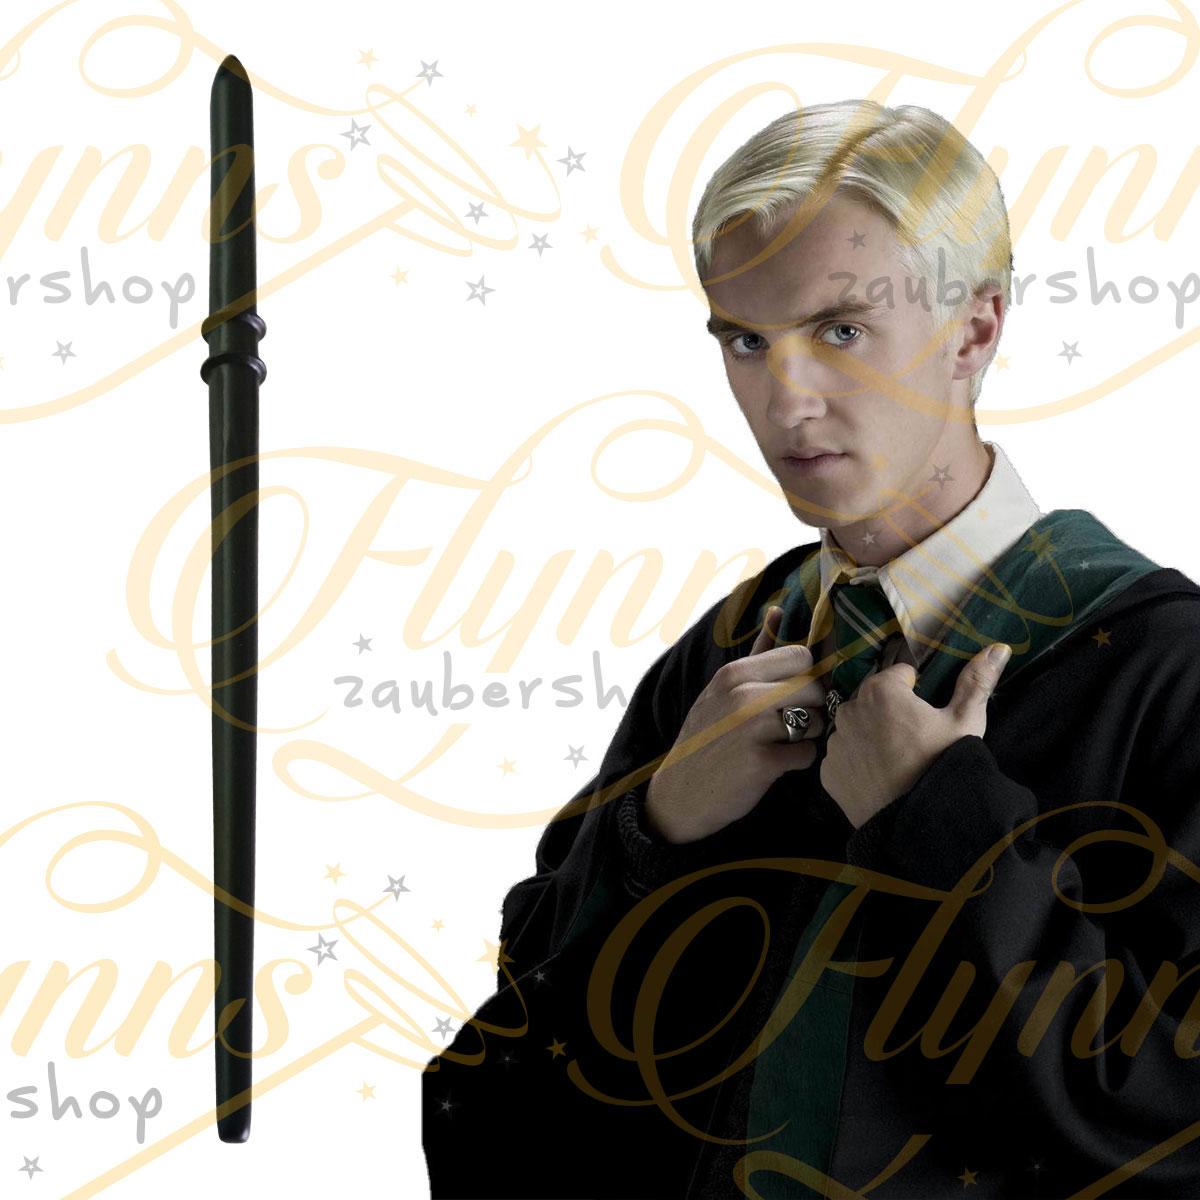 Draco Malfoy | Harry Potter | Flynns Zaubershop